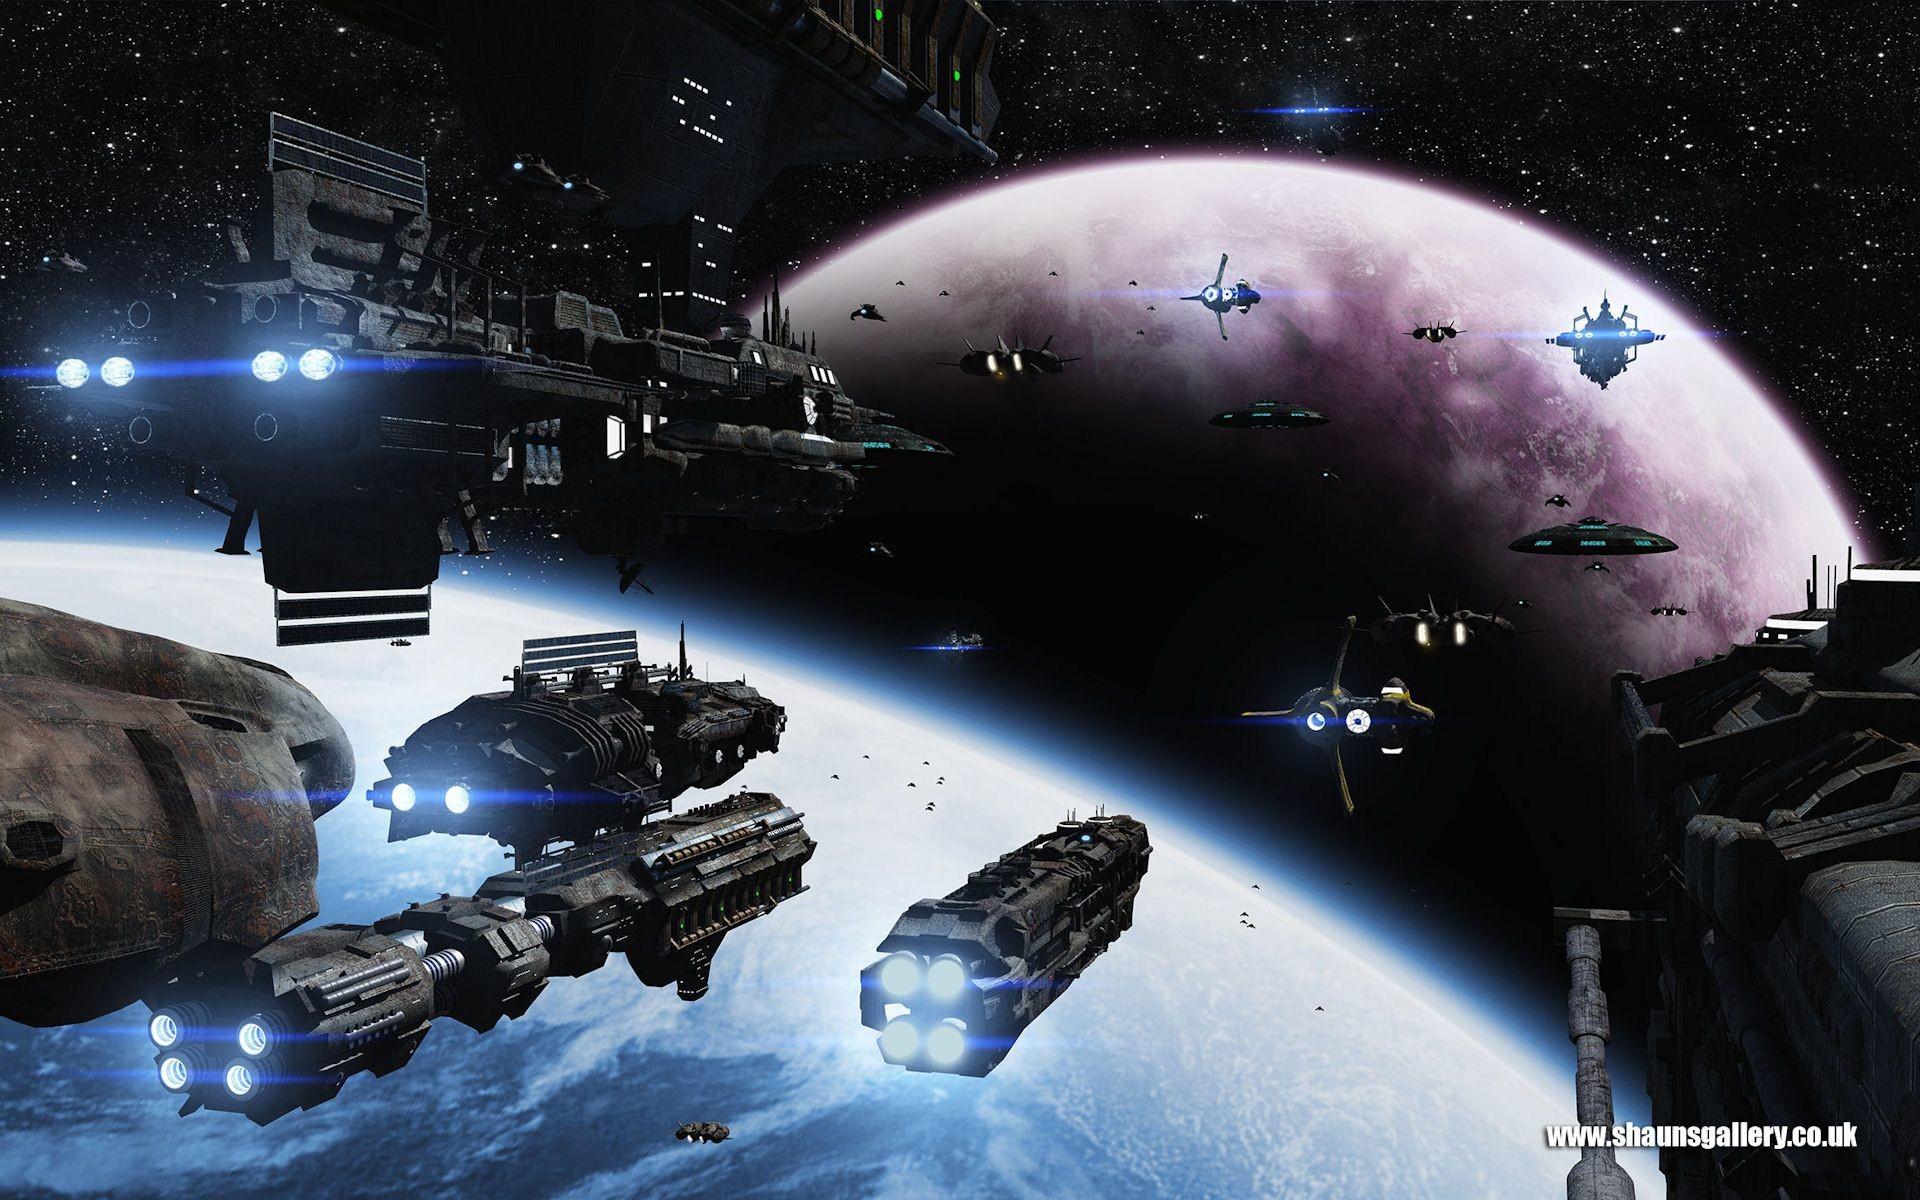 Sci Fi Desktop Backgrounds: Best Sci Fi Wallpaper (72+ Images